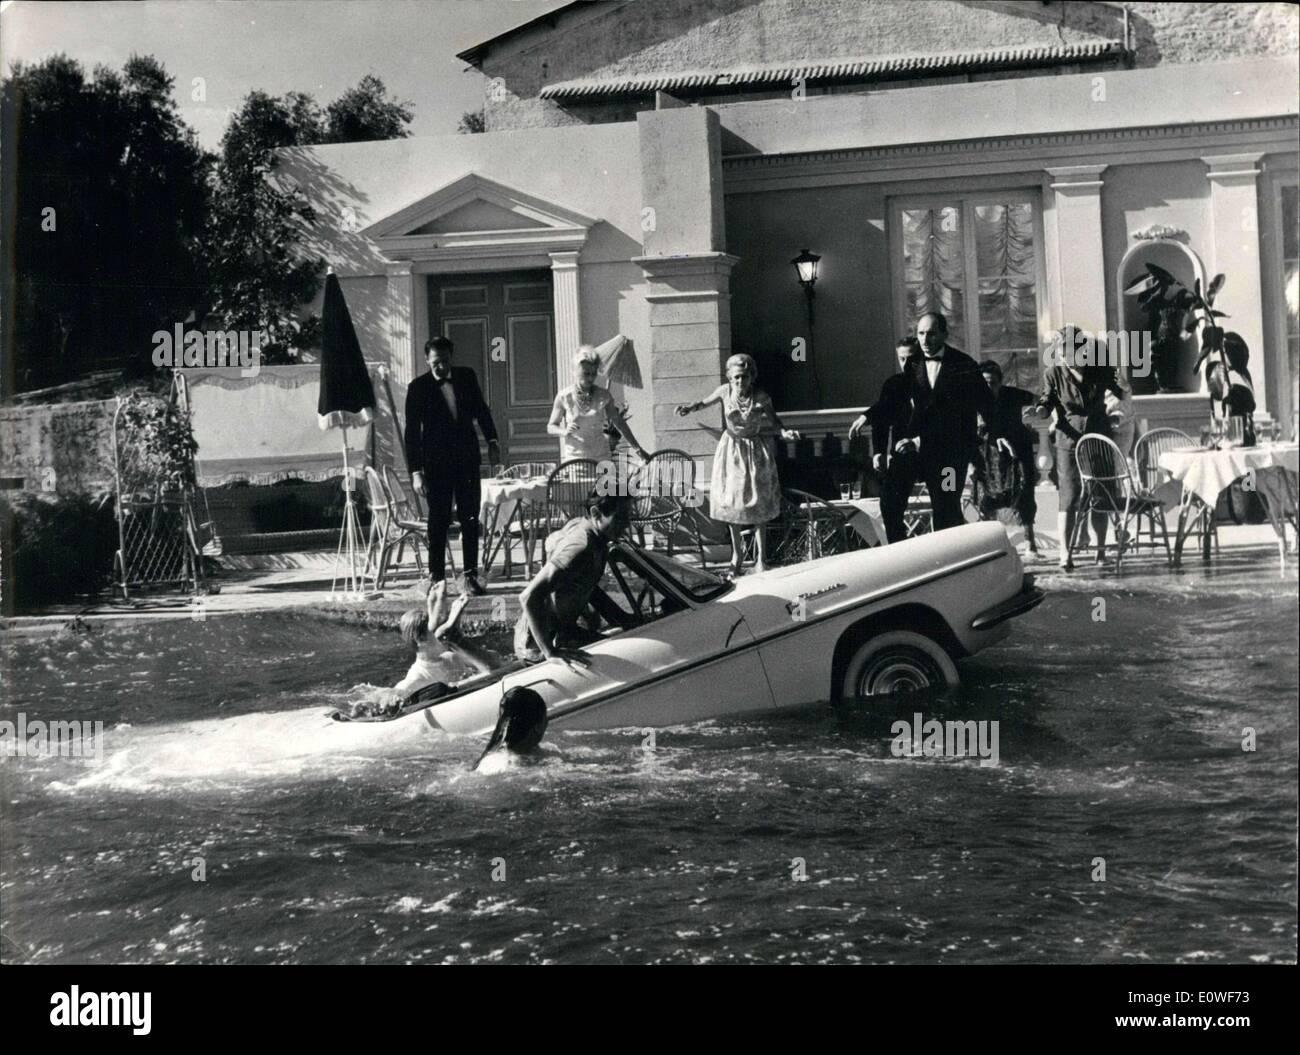 Oct. 13, 1962 - Pierre Montazel directed the movie. - Stock Image